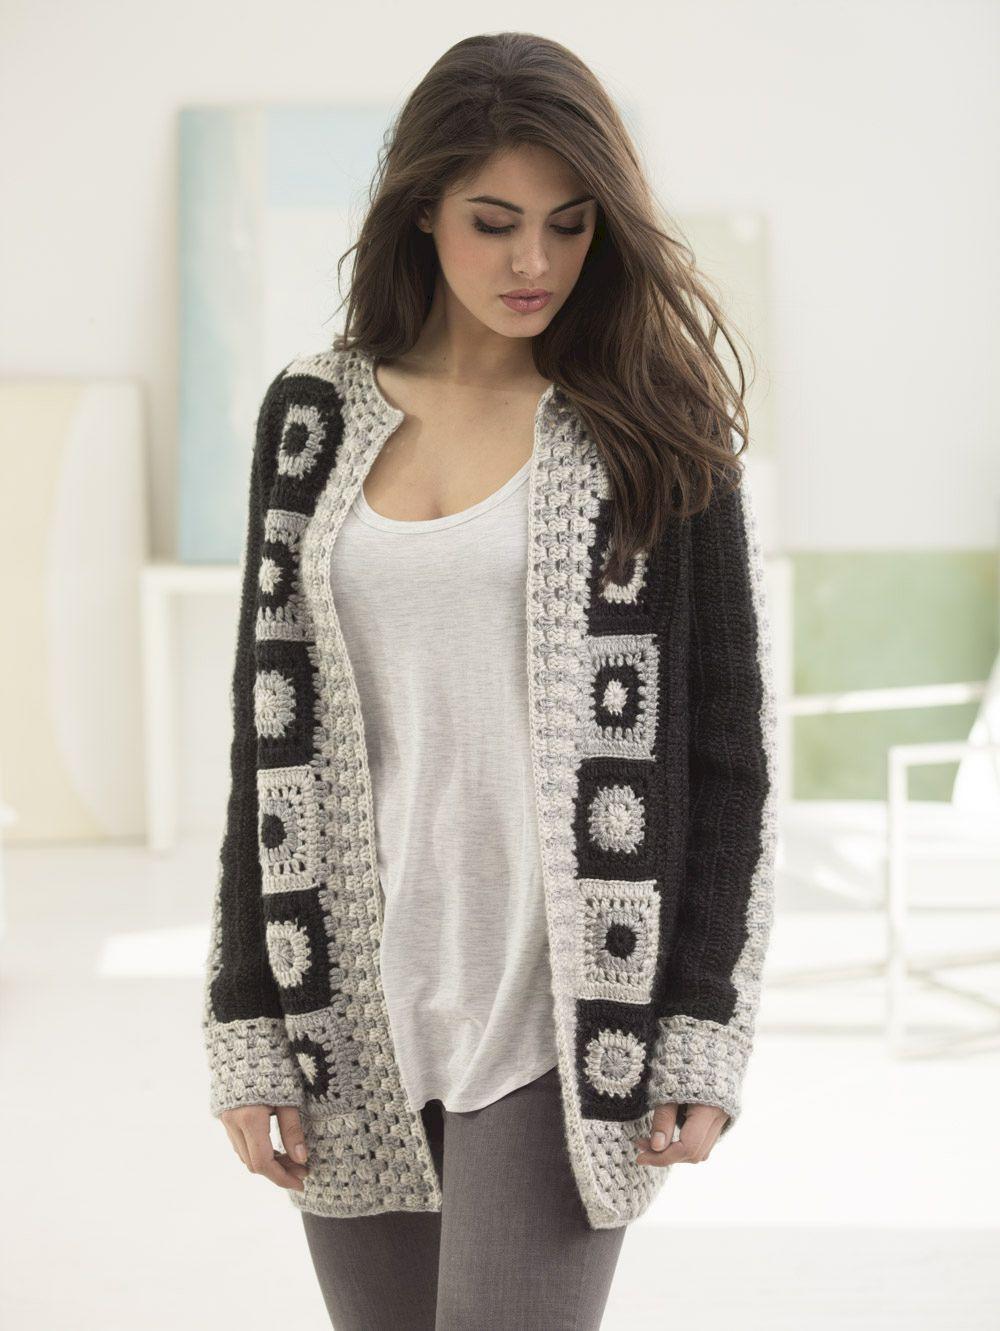 108 DIY Crochet Granny Square Jacket Cardigan Free Patterns ...